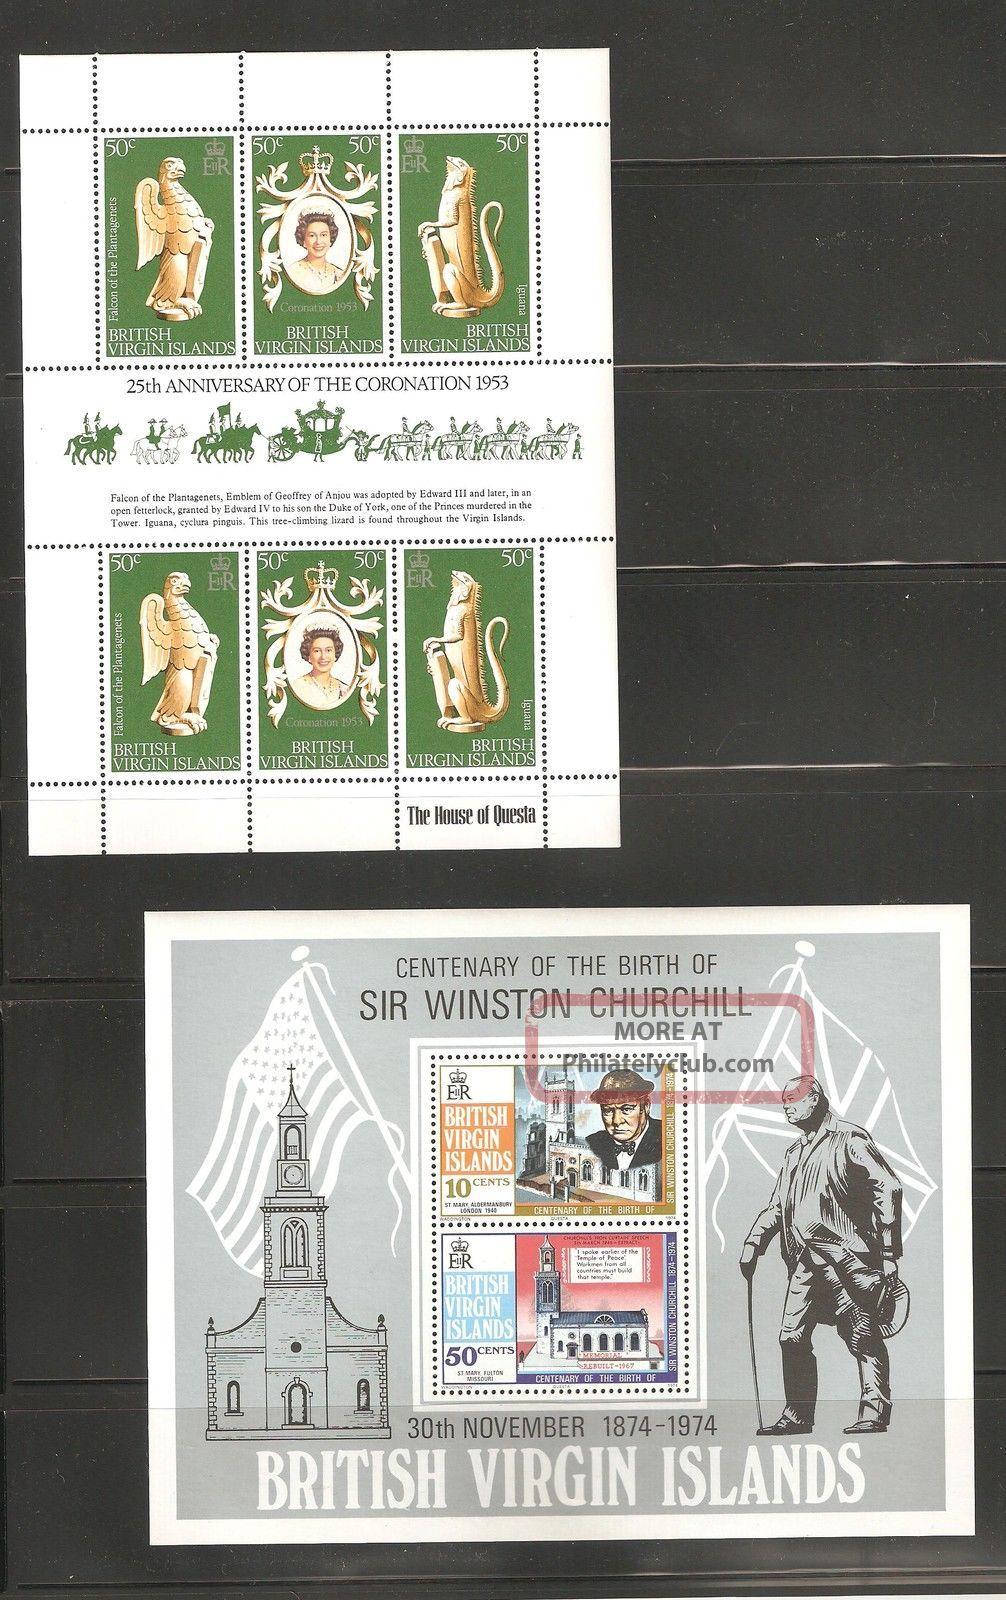 Virgin Islands 1978 S 337 & 1974 S 278 - 279z Churchill Souvenir Sheet Vf British Colonies & Territories photo